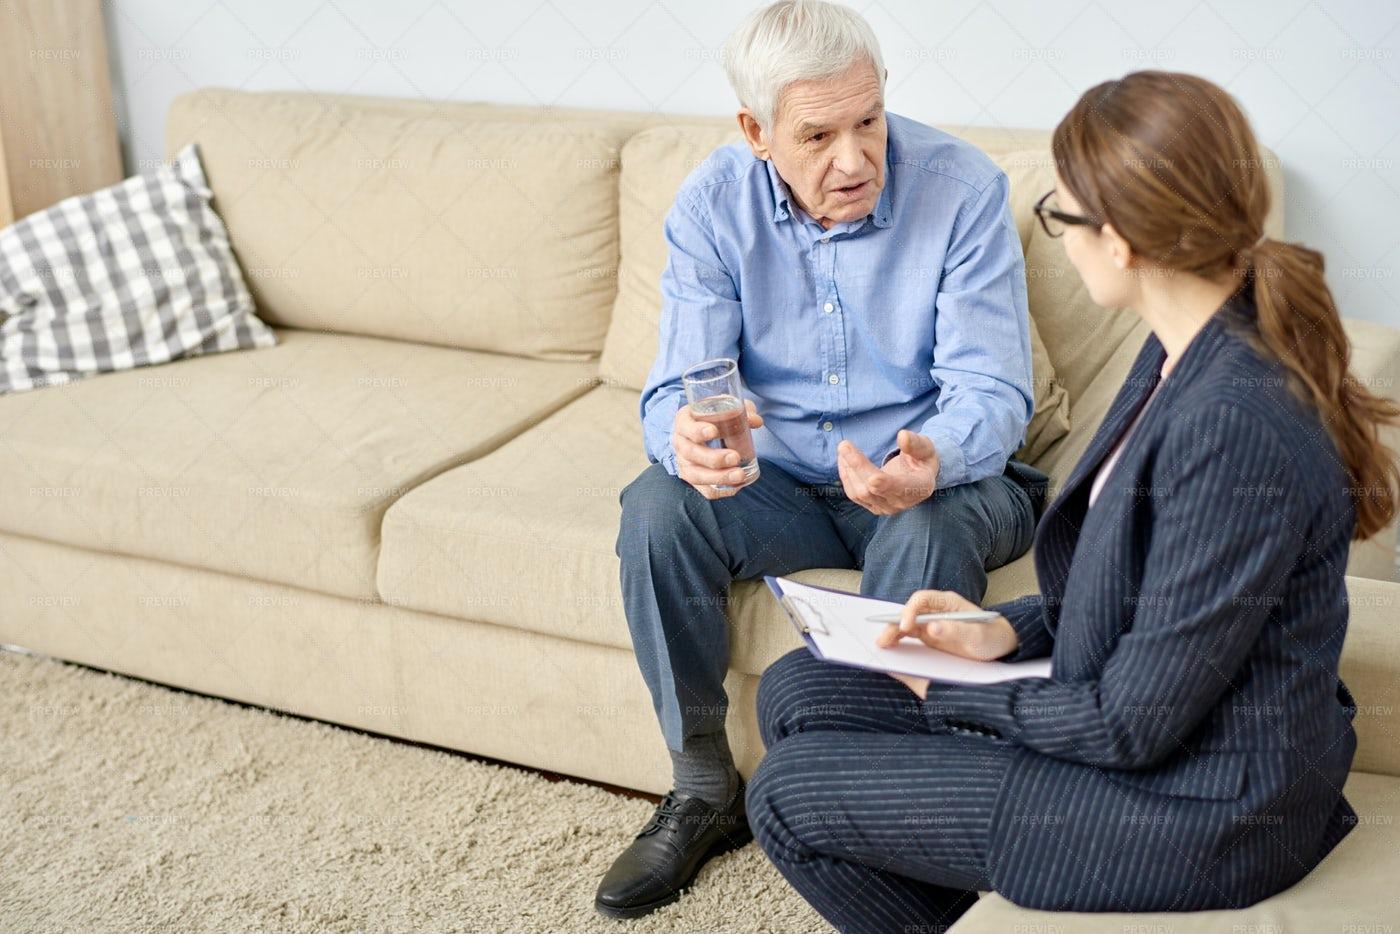 Senior Patient Talking To...: Stock Photos